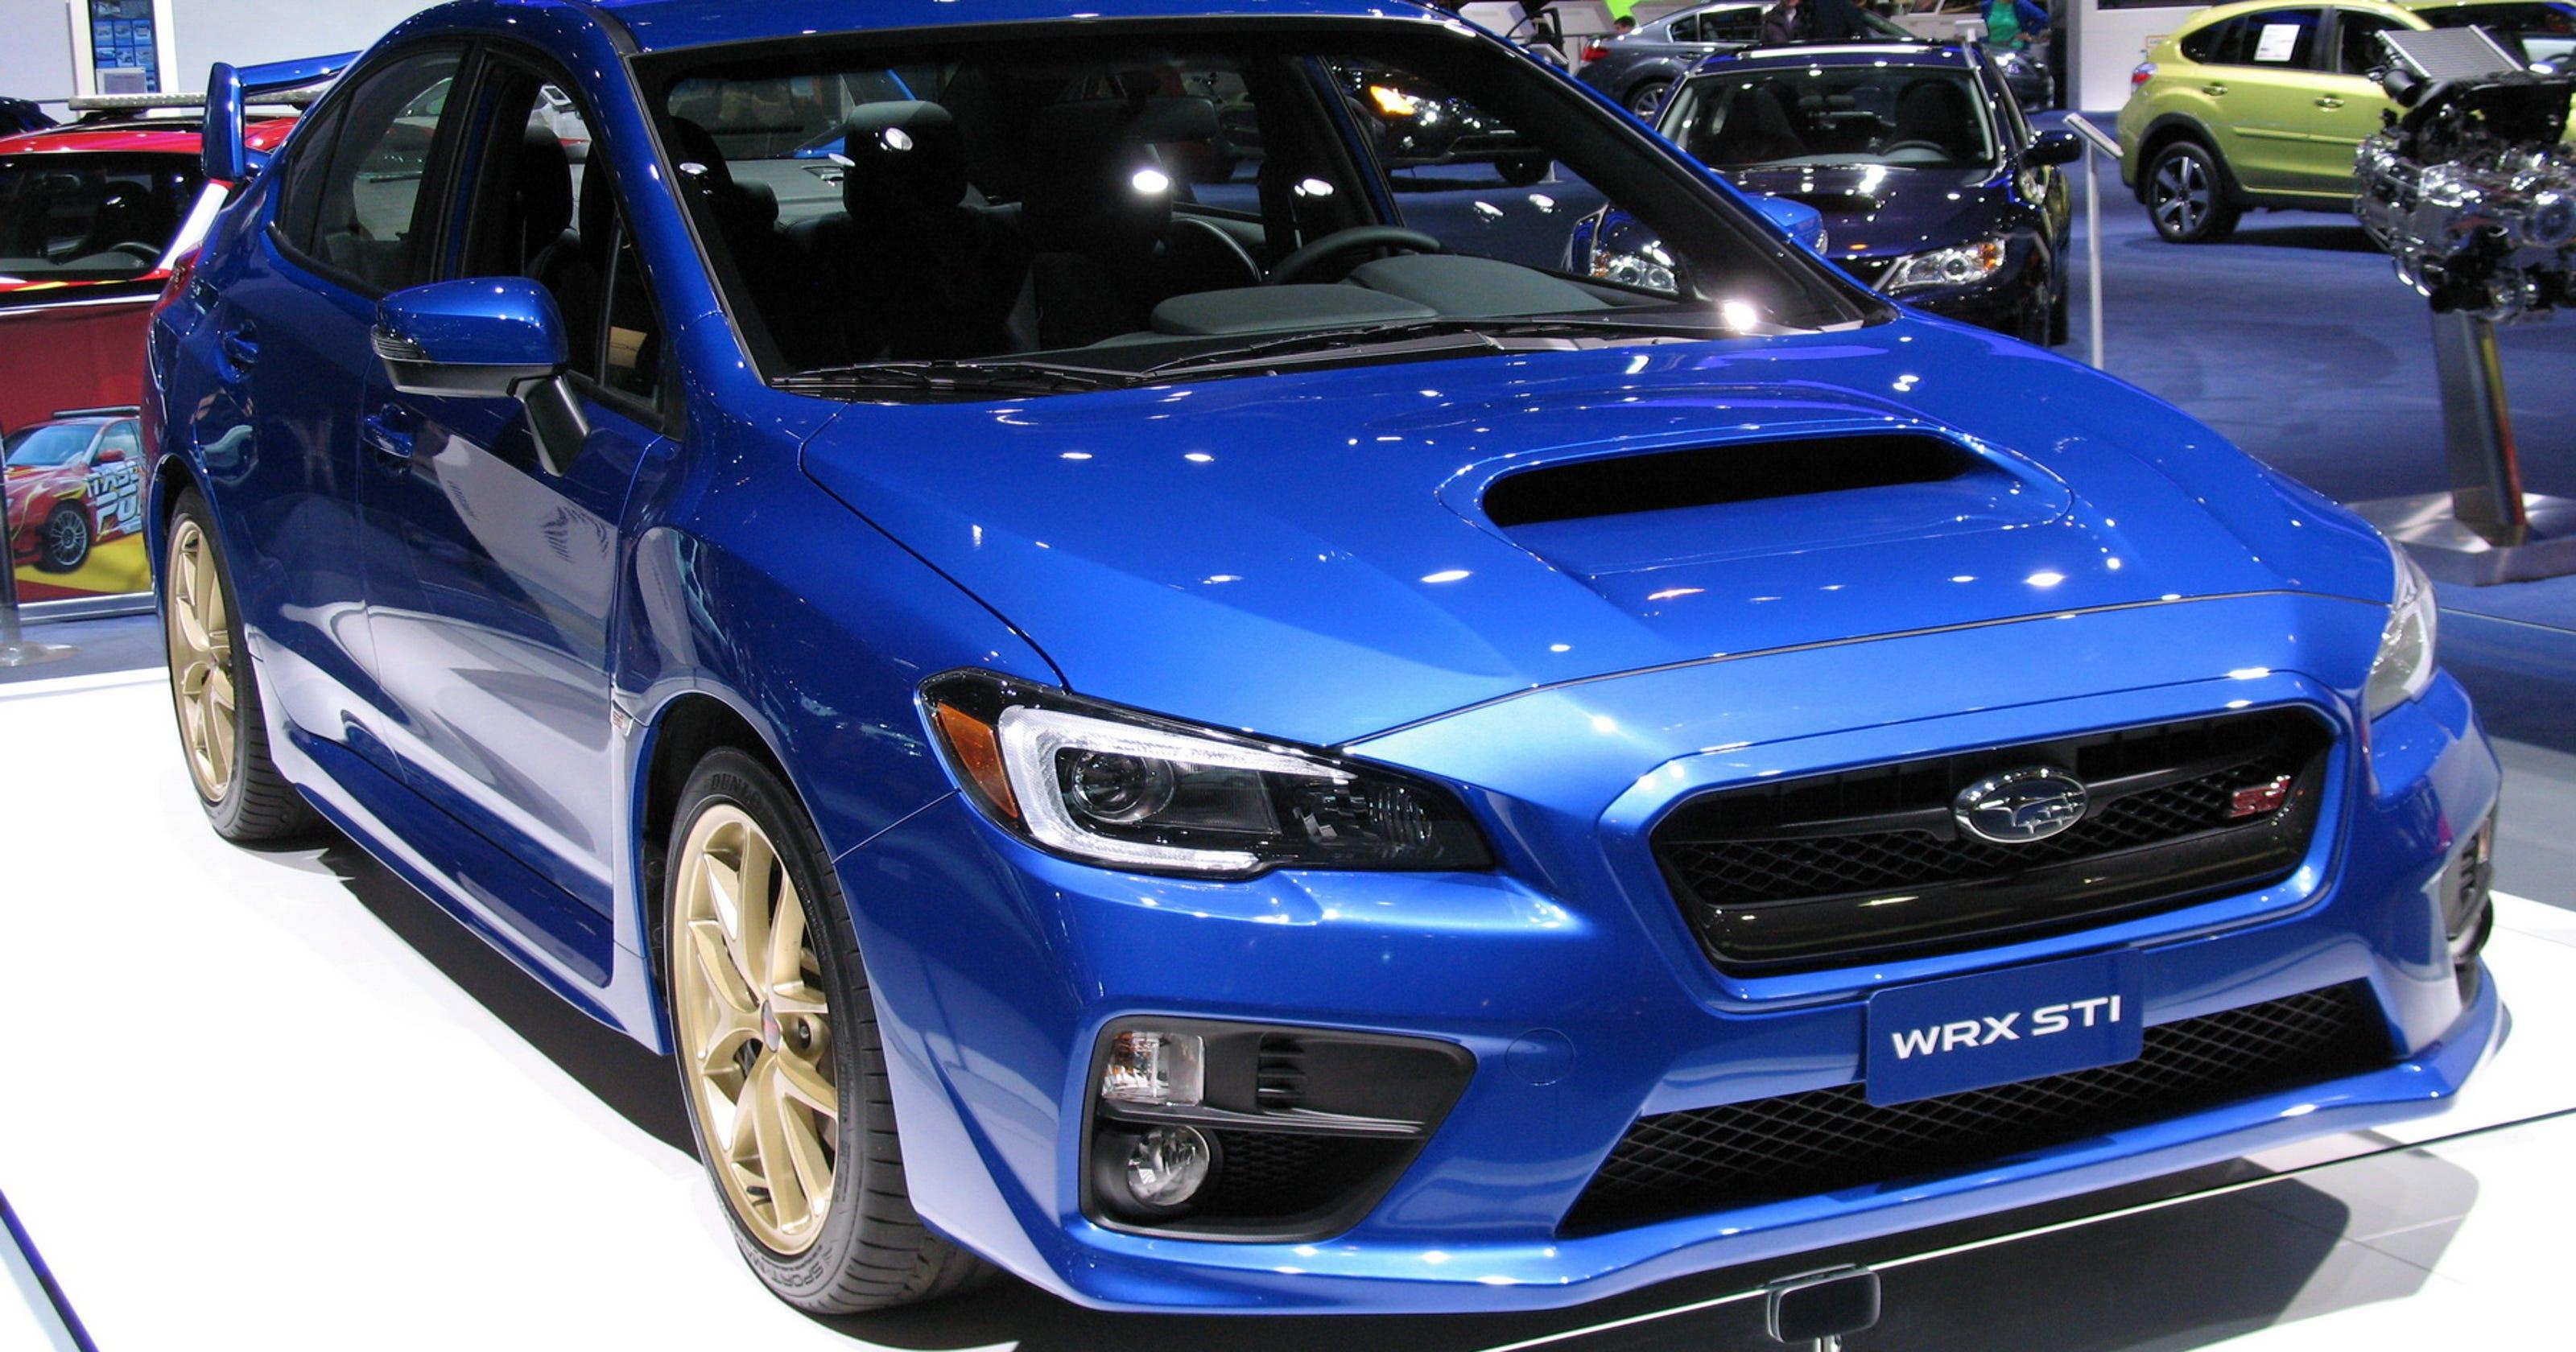 2016 Subaru WRX STI Is Iconic Performance Flagship